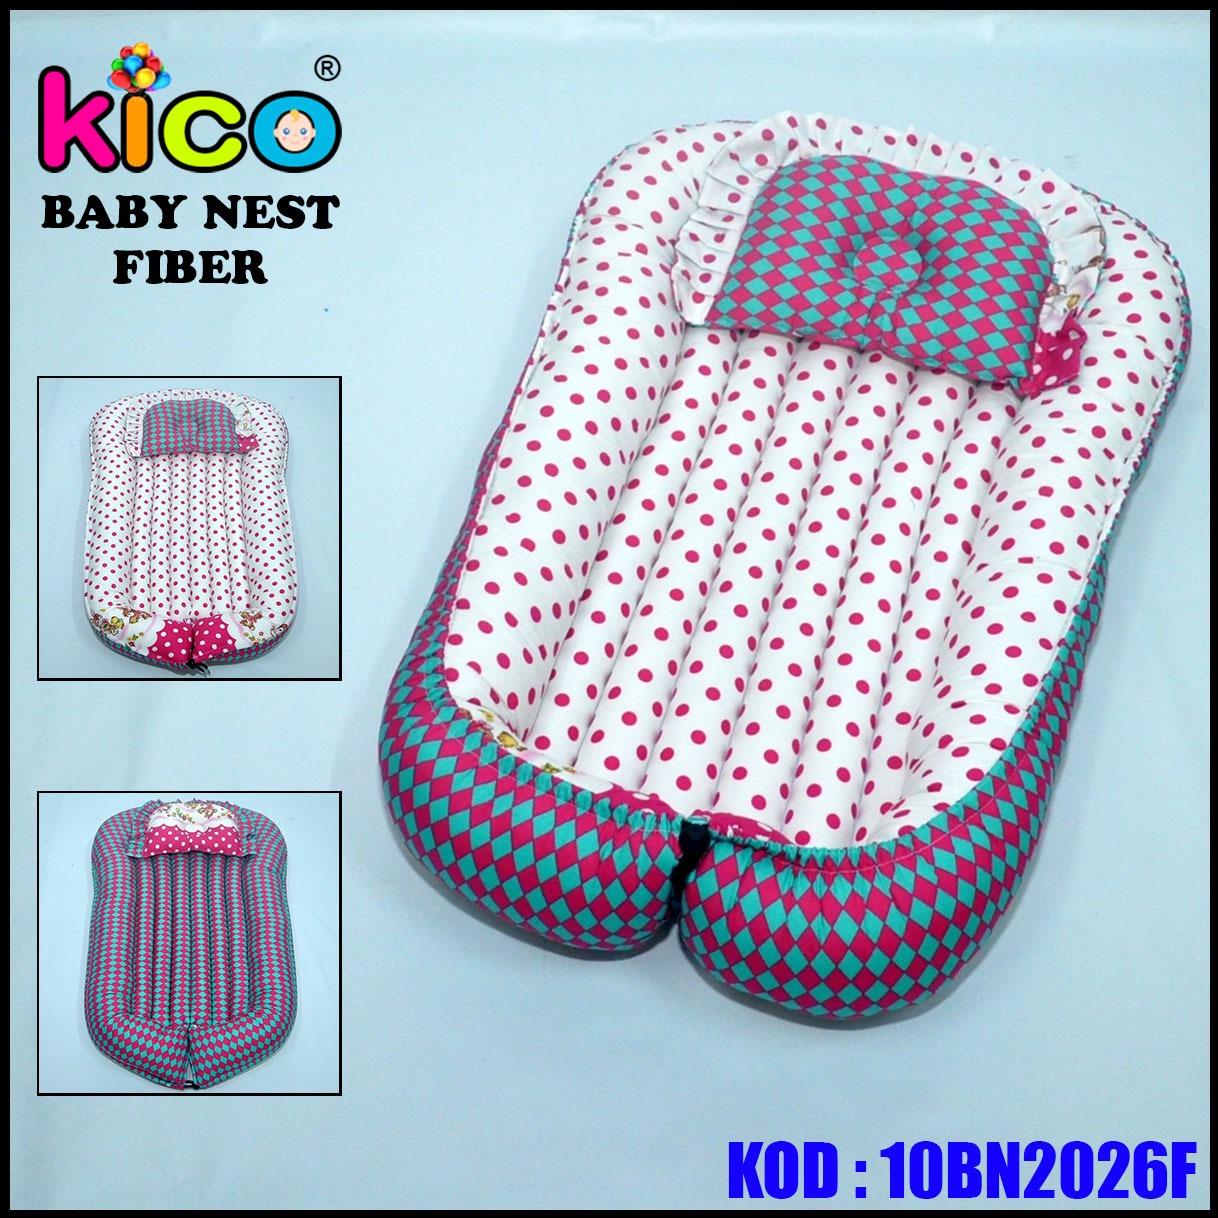 Baby Nest Sweet Pink Polkadot (10BN2026F)